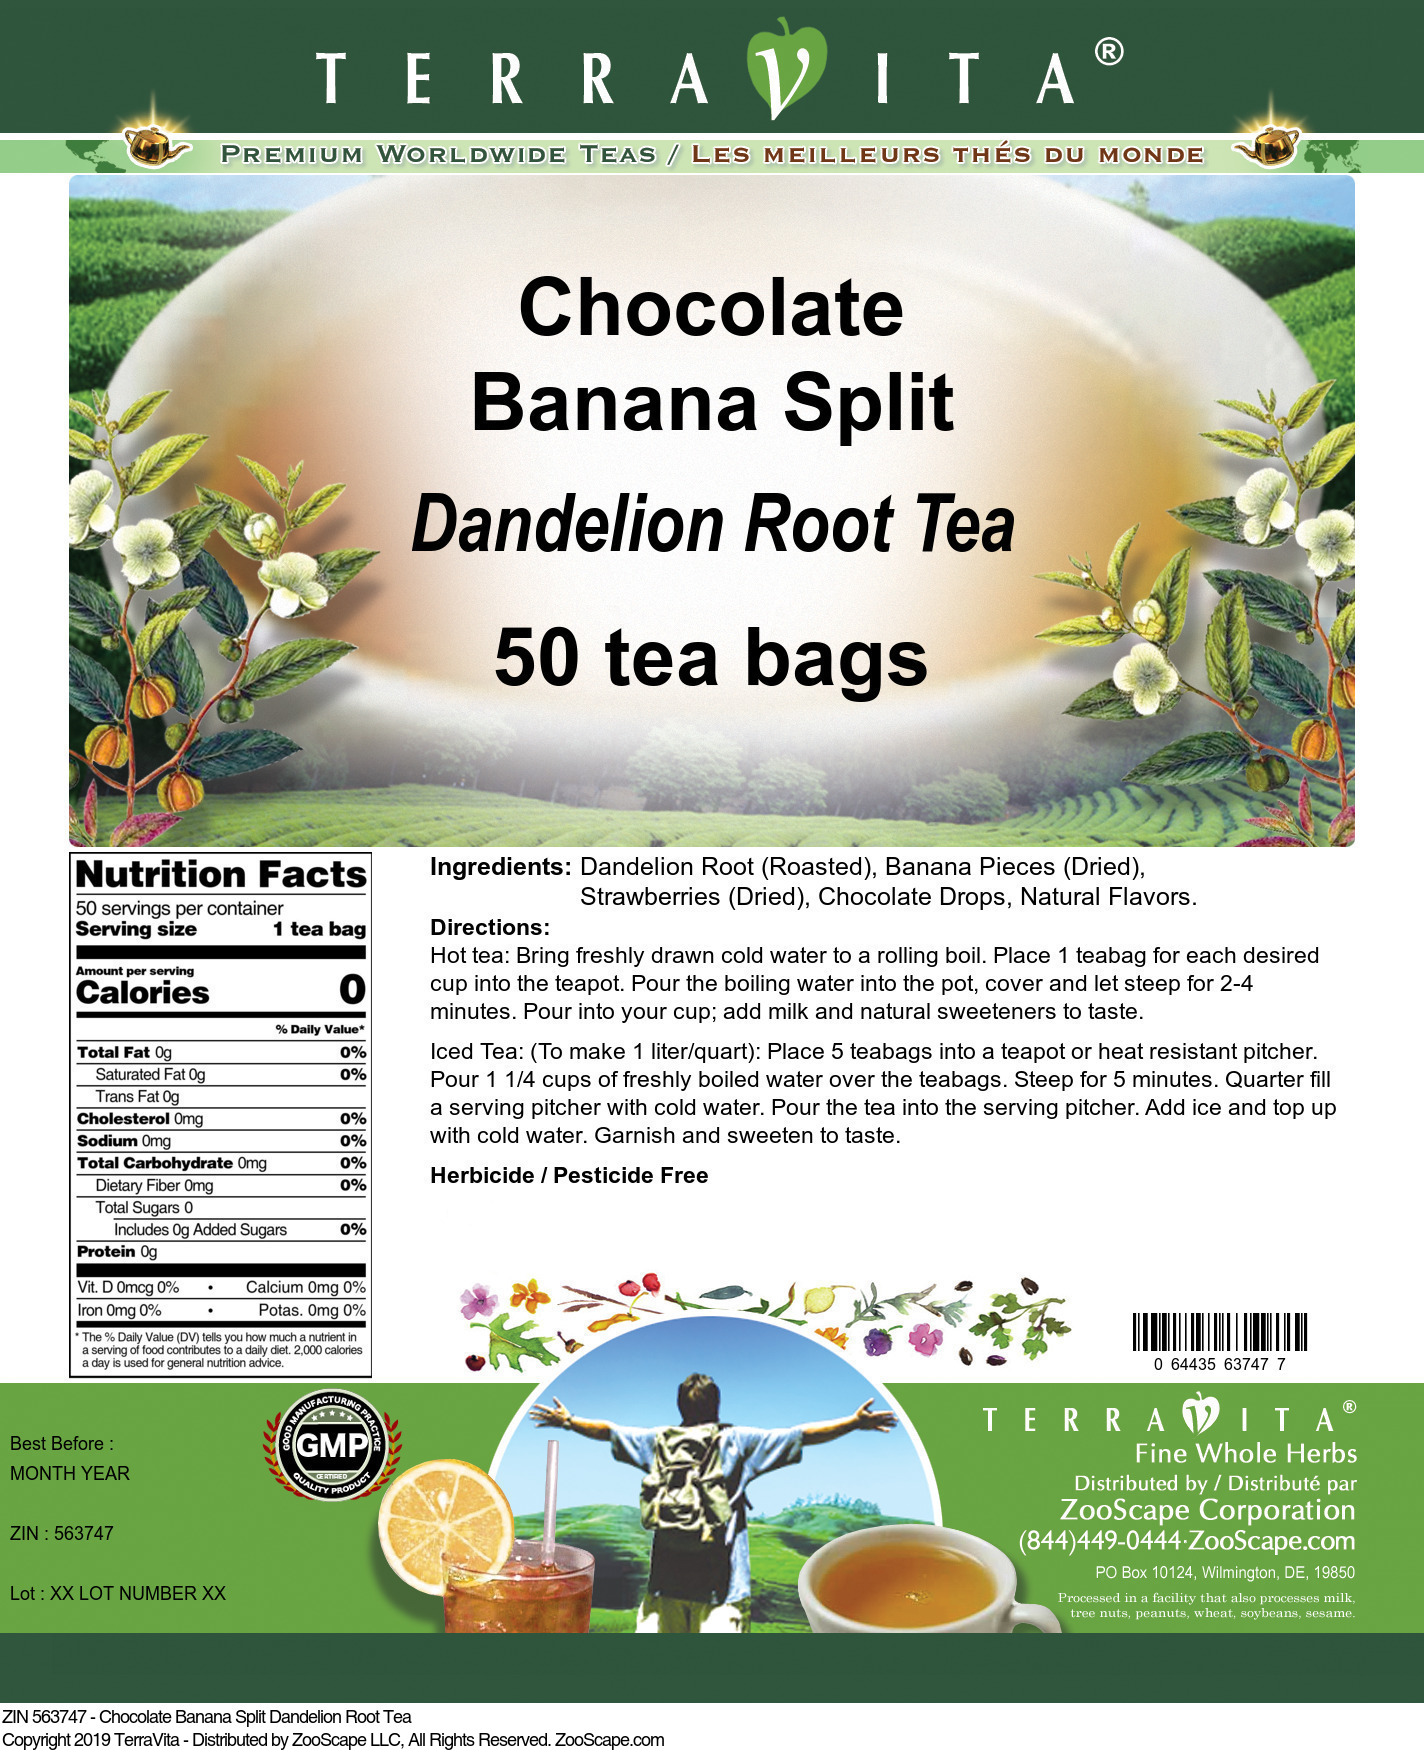 Chocolate Banana Split Dandelion Root